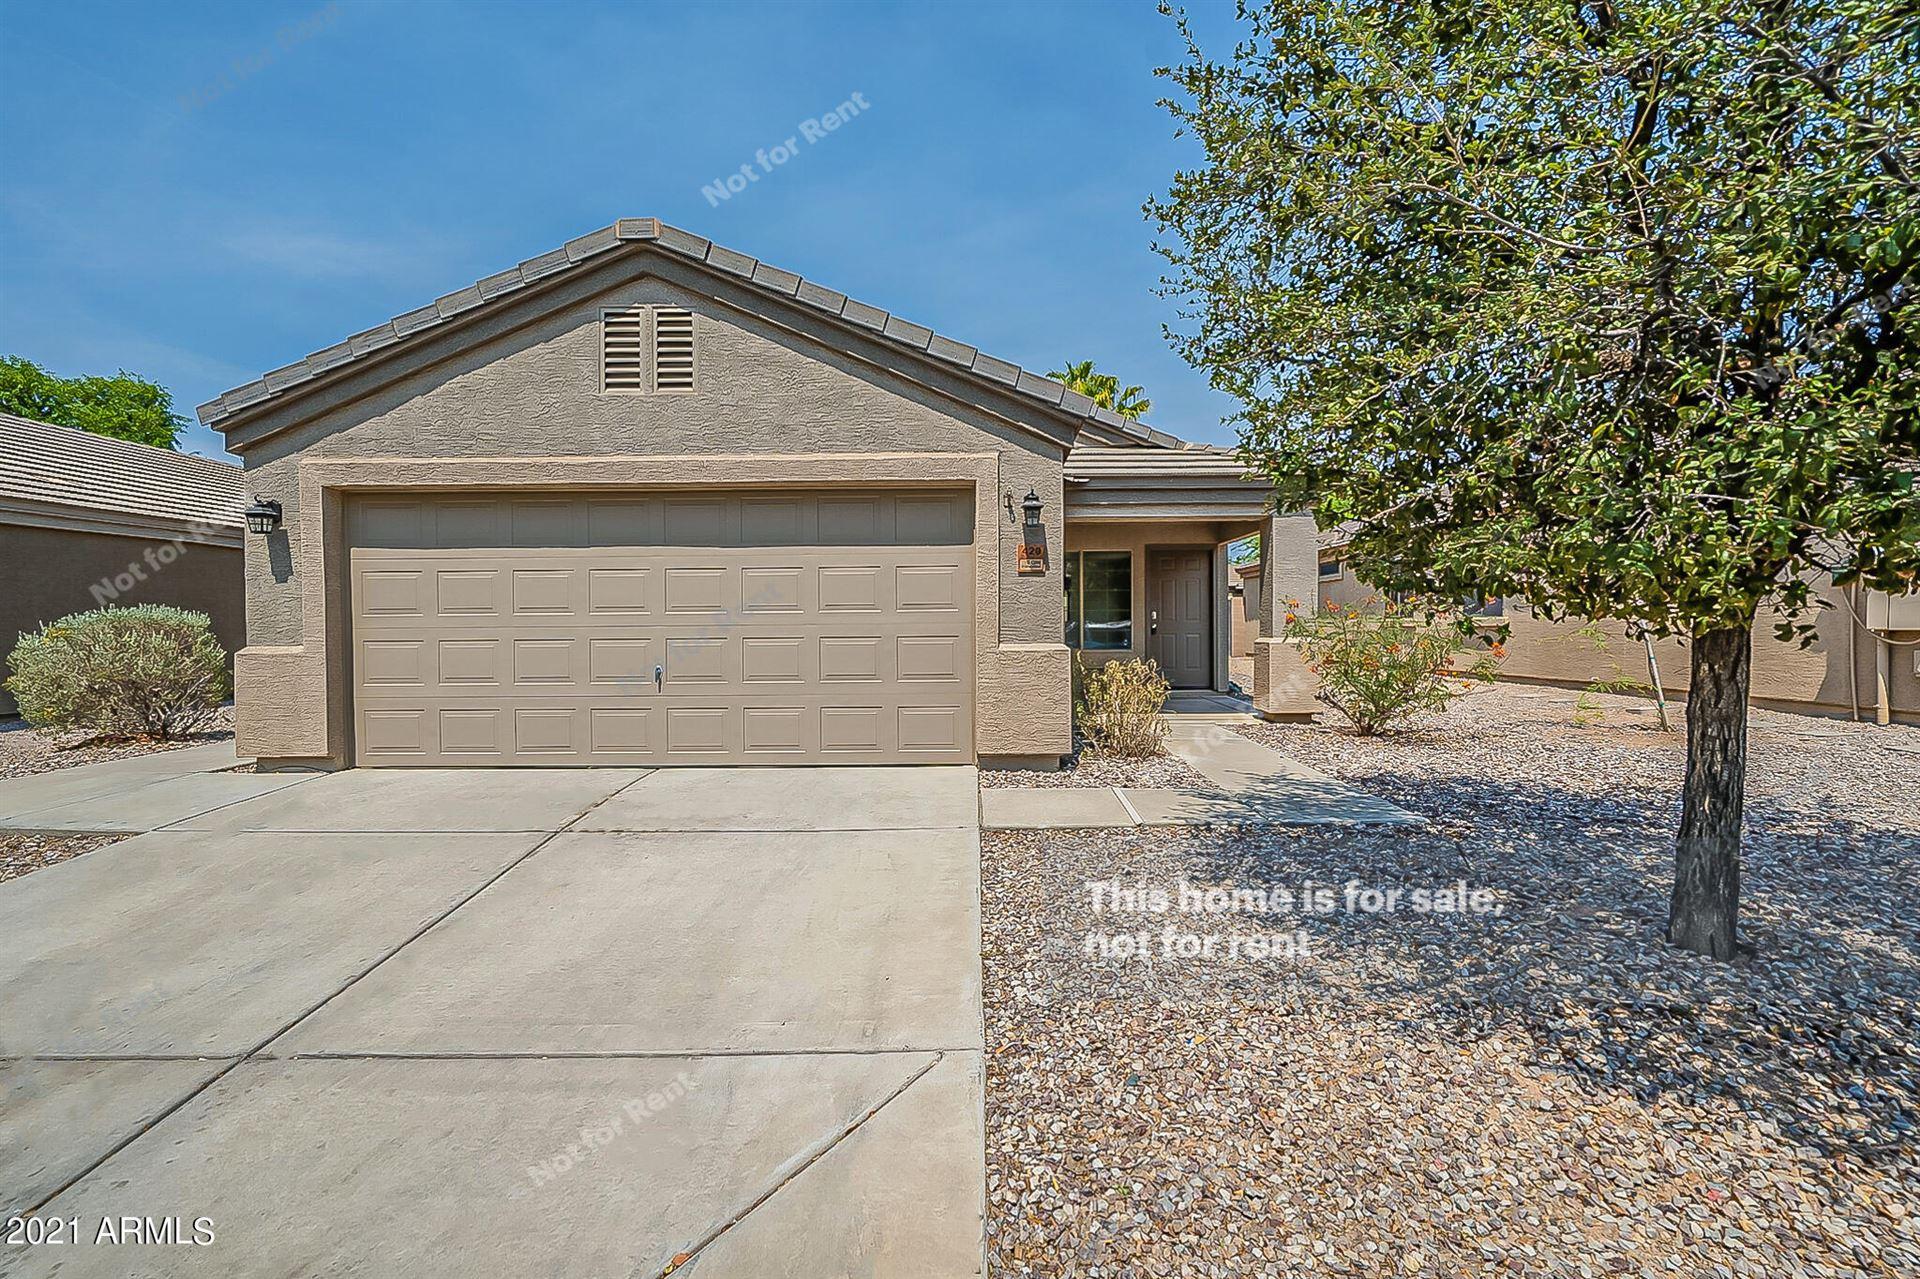 420 S SABRINA --, Mesa, AZ 85208 - MLS#: 6251872